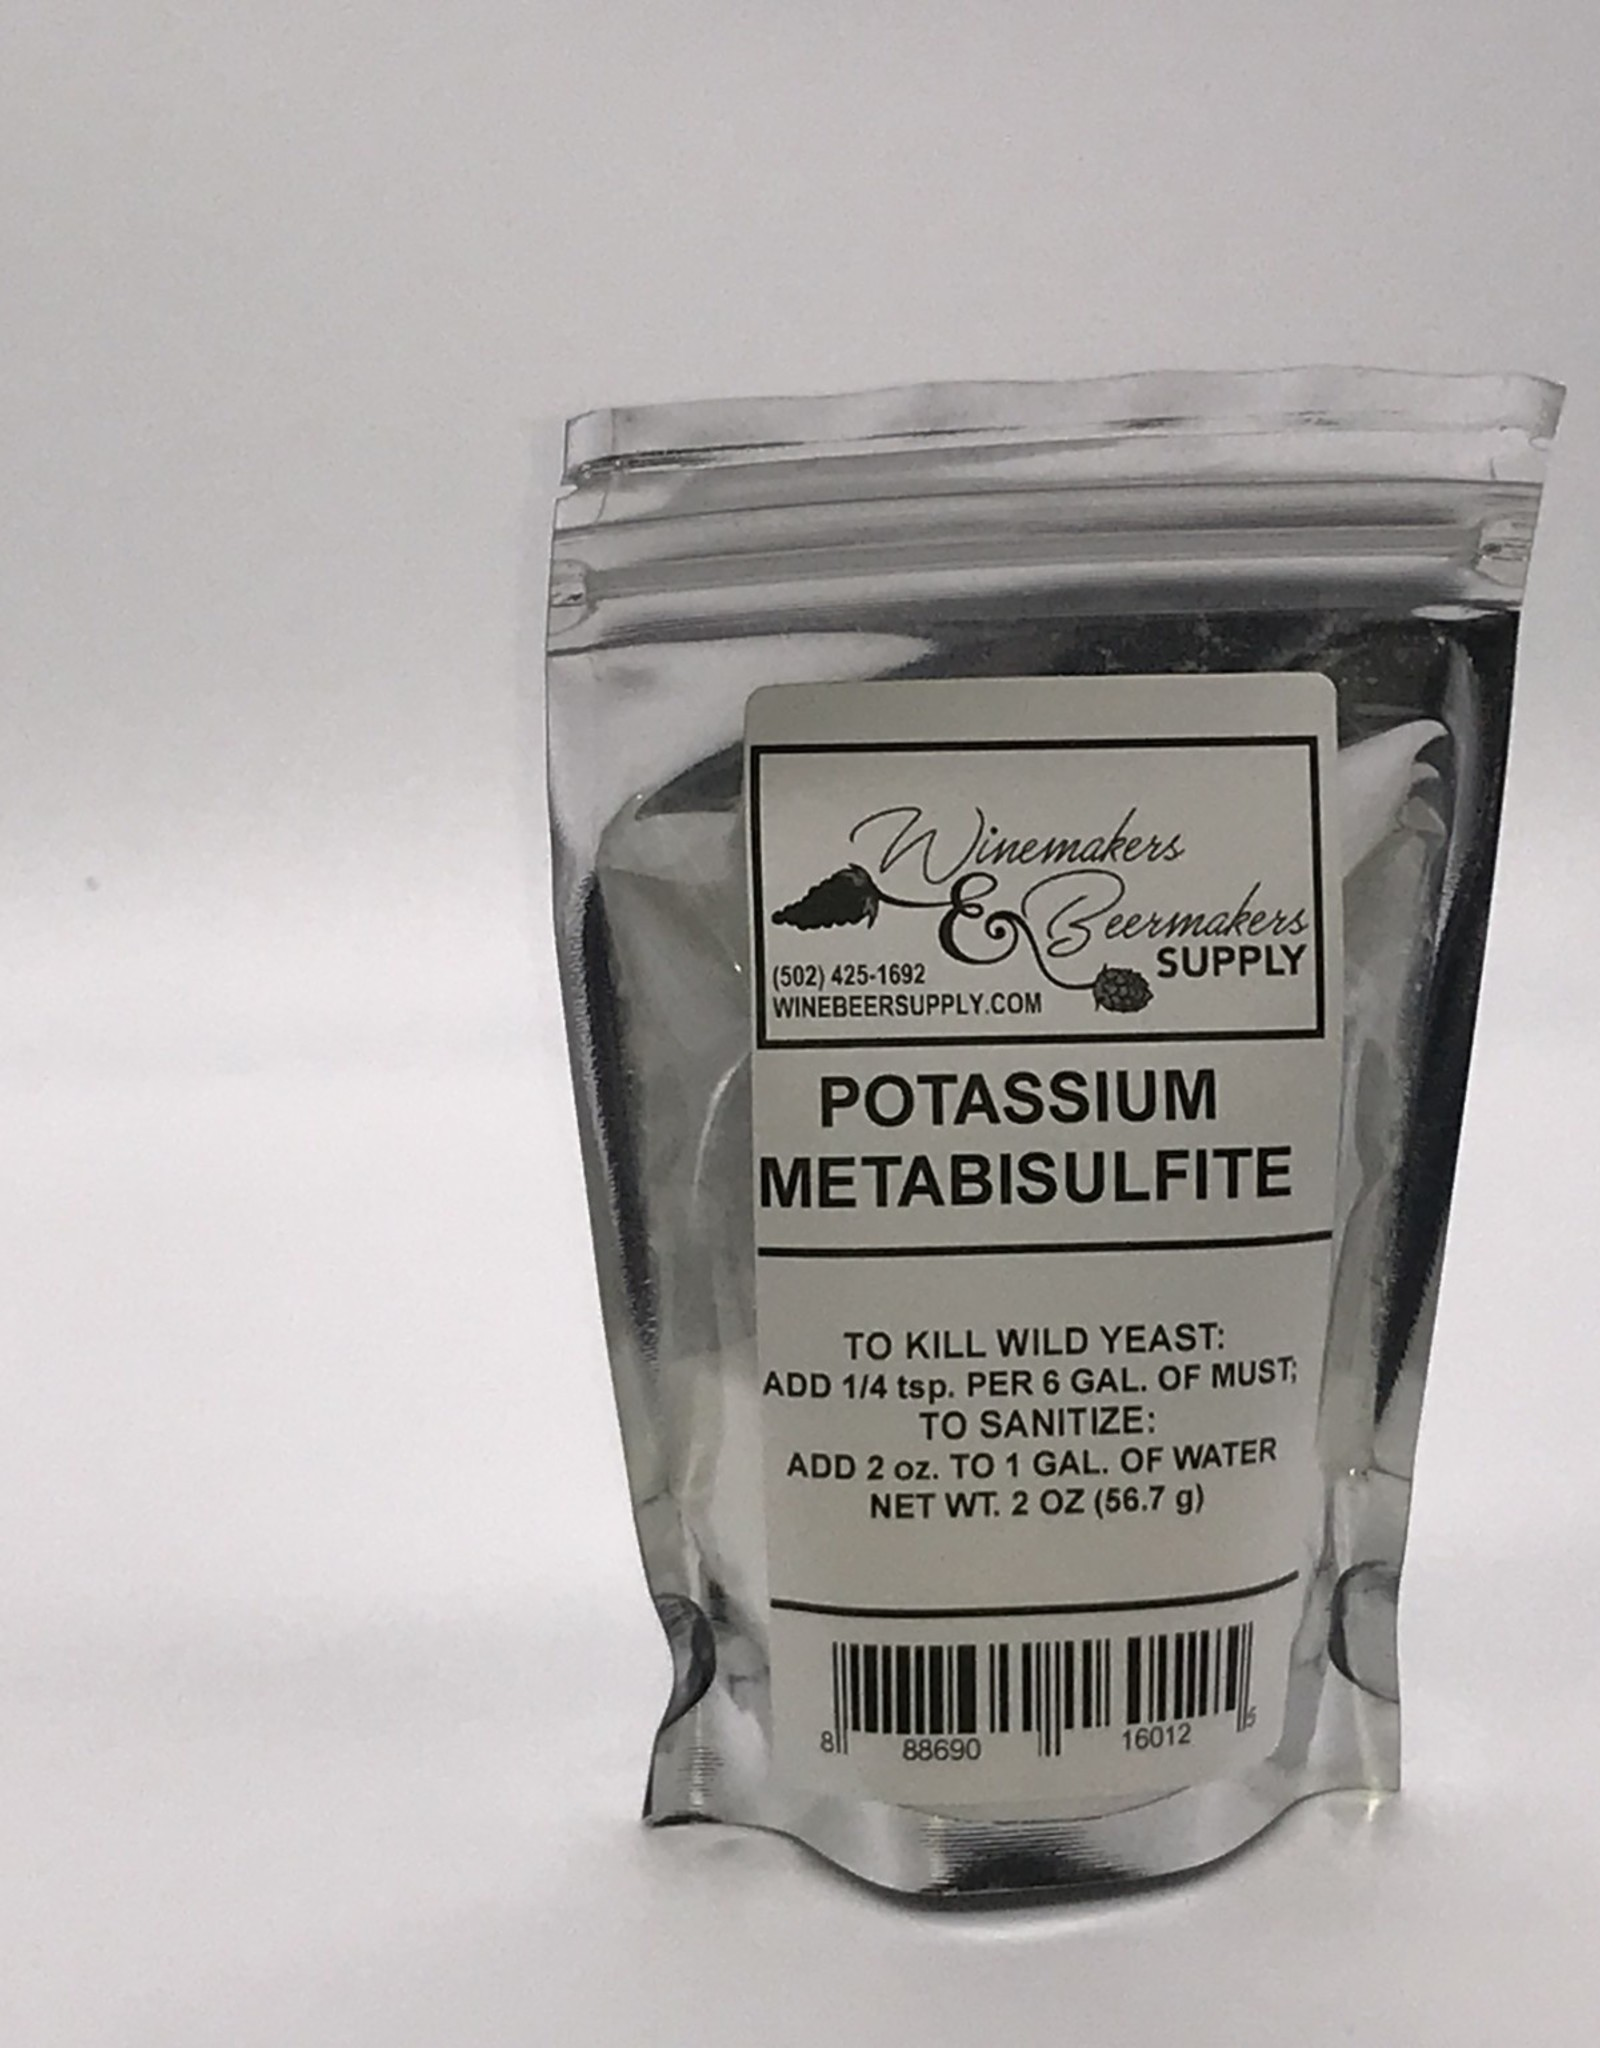 POTASSIUM METABISULPHITE 2 OZ